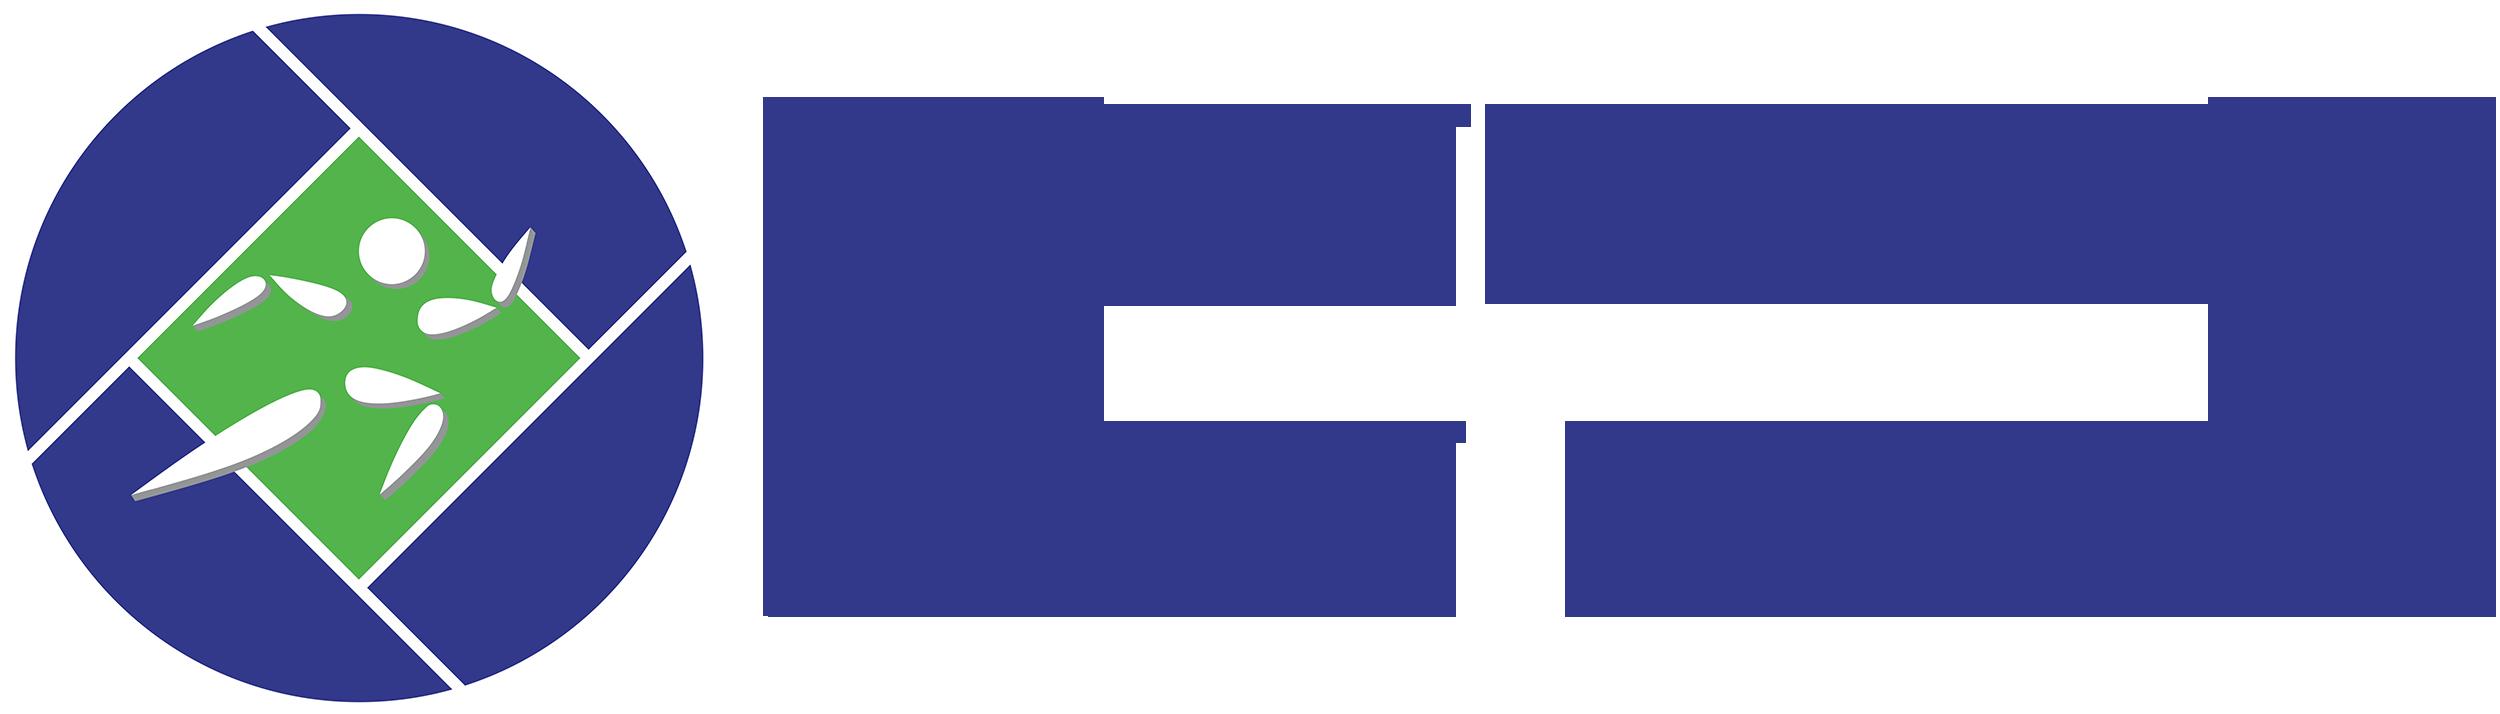 ENTRY FORM: South Bank Mixed Netball Season 3 2021